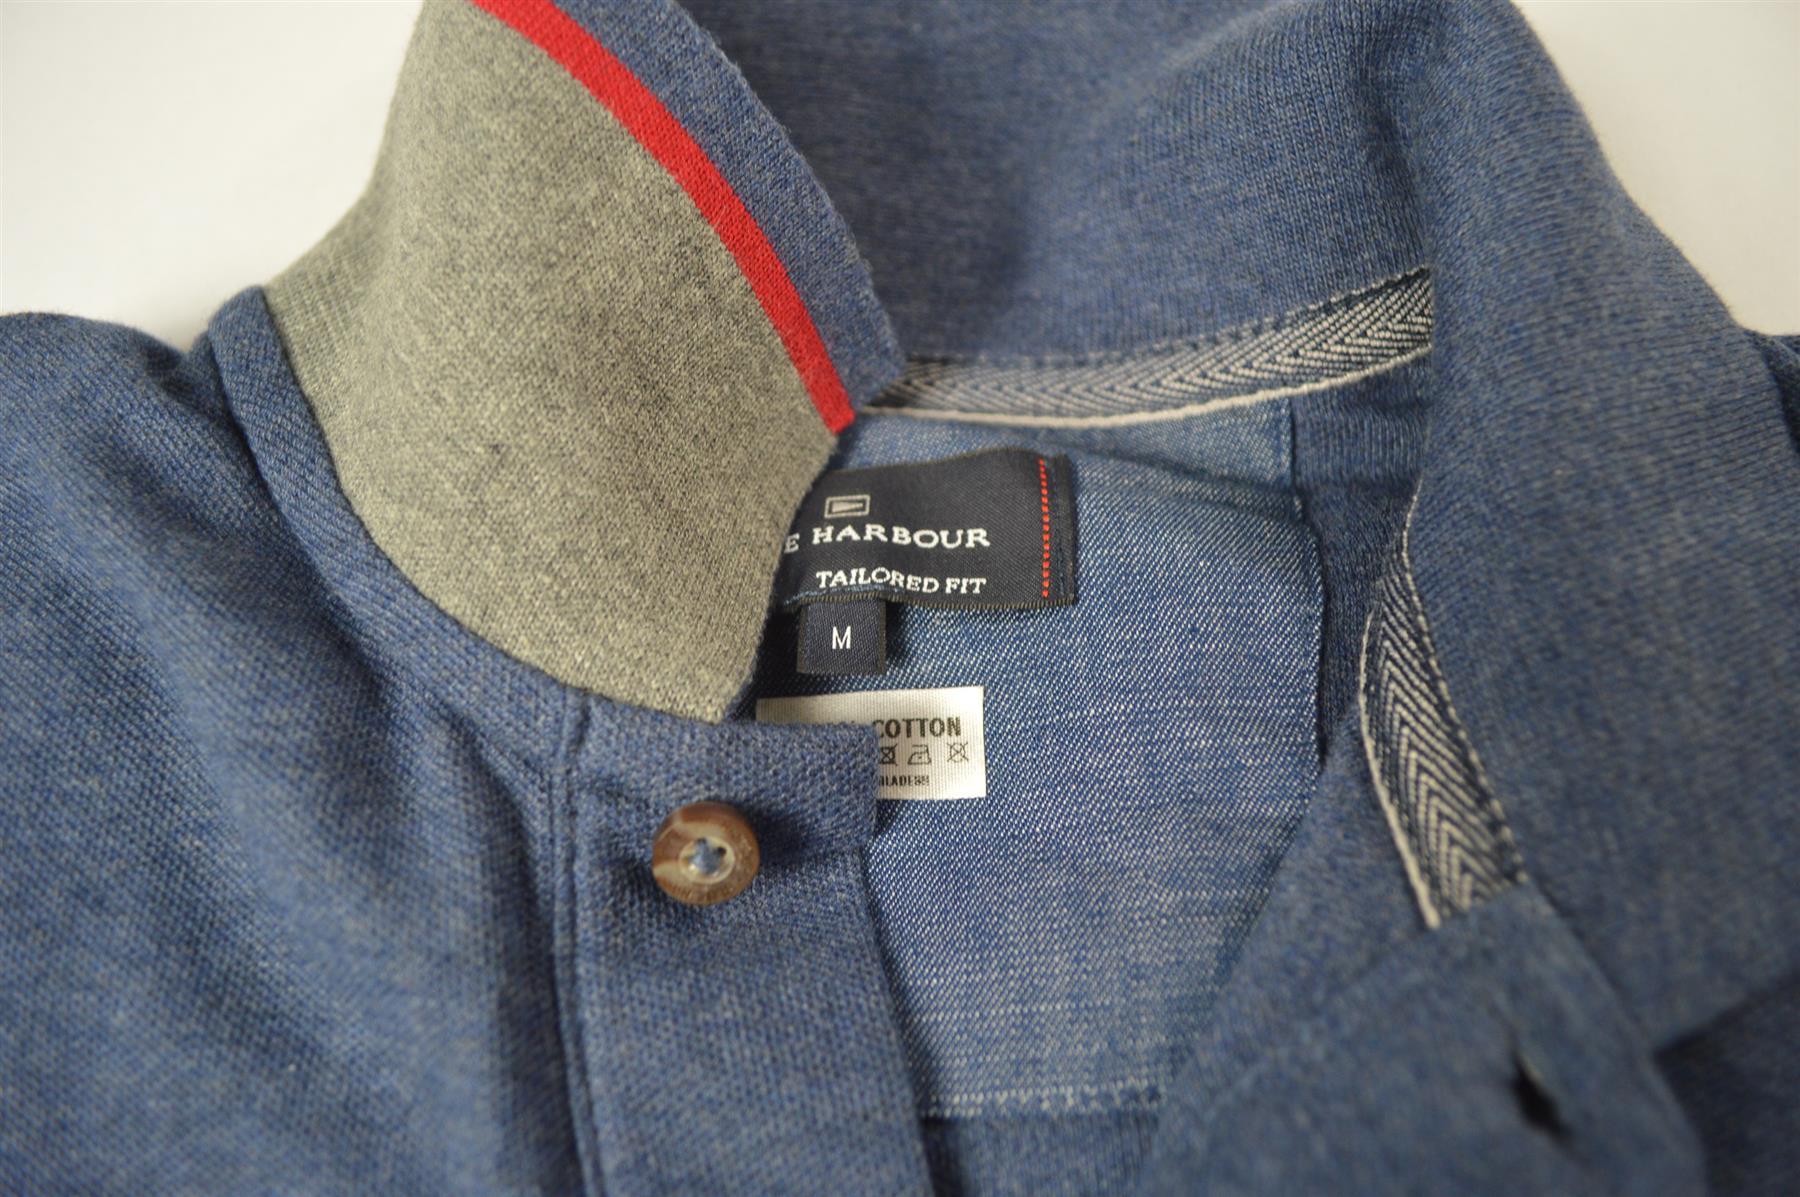 M-amp-S-BLUE-HARBOUR-Camisa-Polo-Para-Hombre-a-Rayas-Contraste-Cuello-Logotipo-Bordado miniatura 3